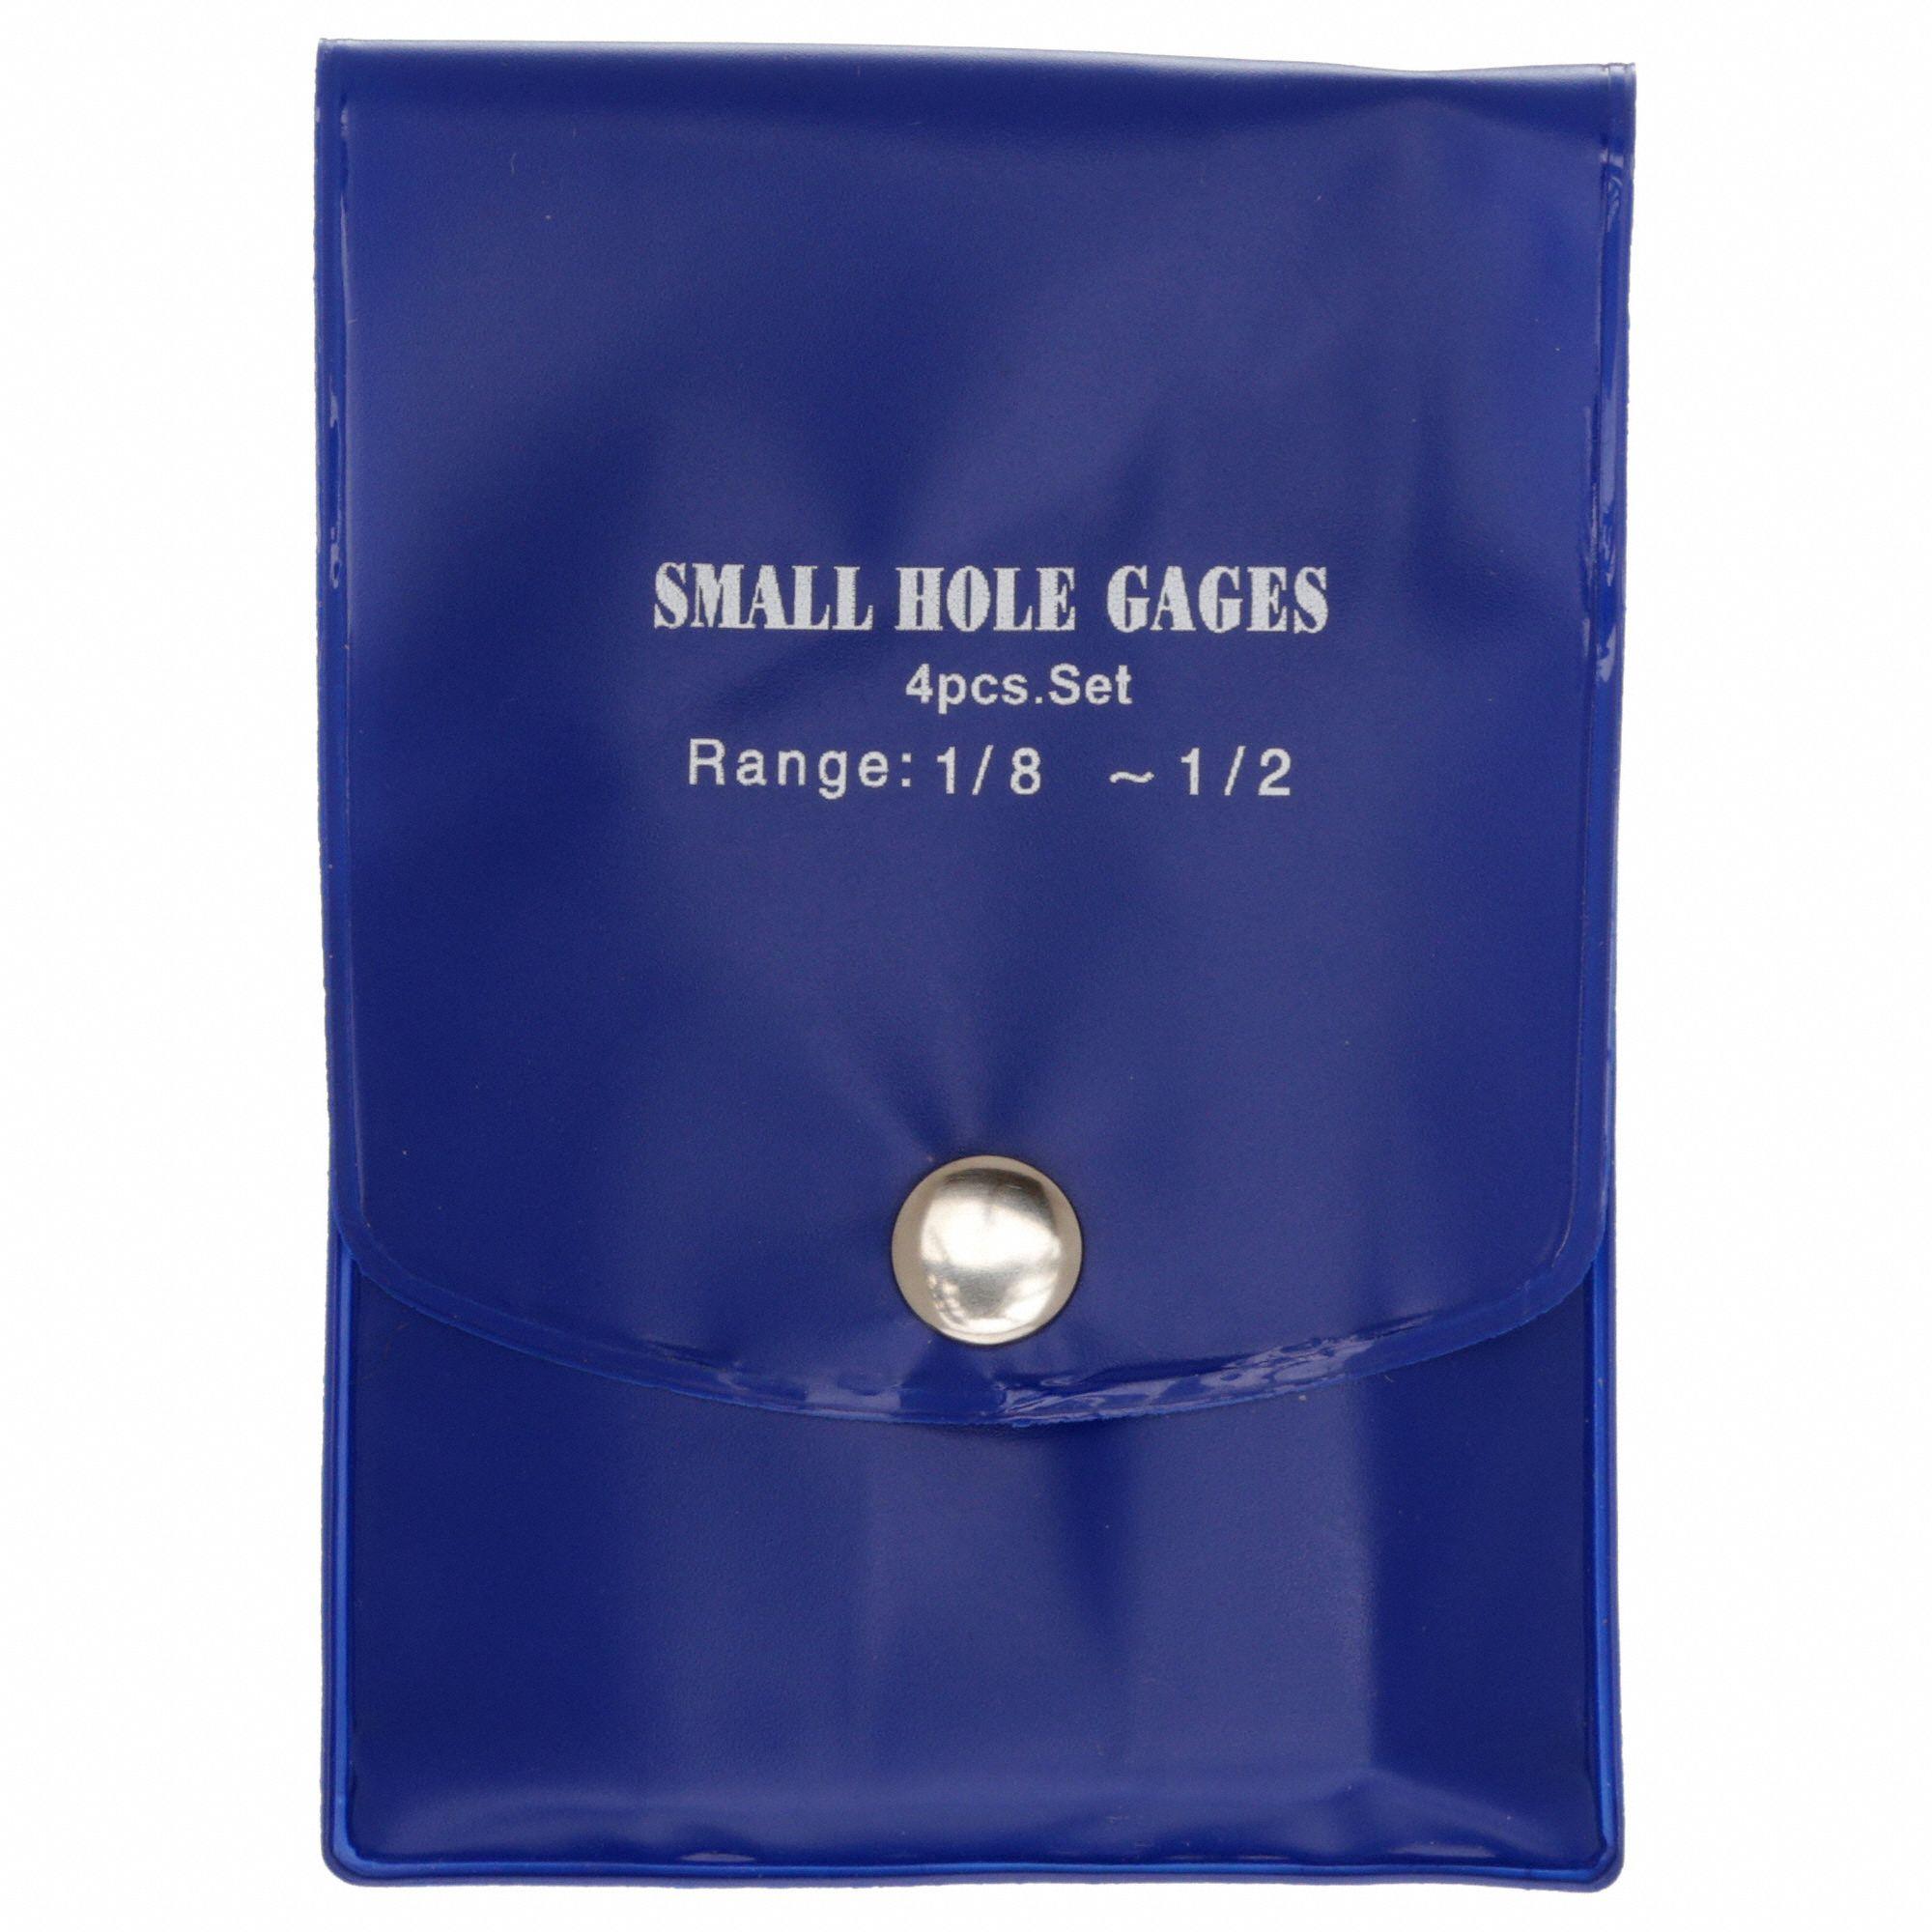 "4pcs 3-13mm Small Hole Bore Gauge Set Full Ball Type Gage 1//8~1//2/"" 0.125-0.5/"""